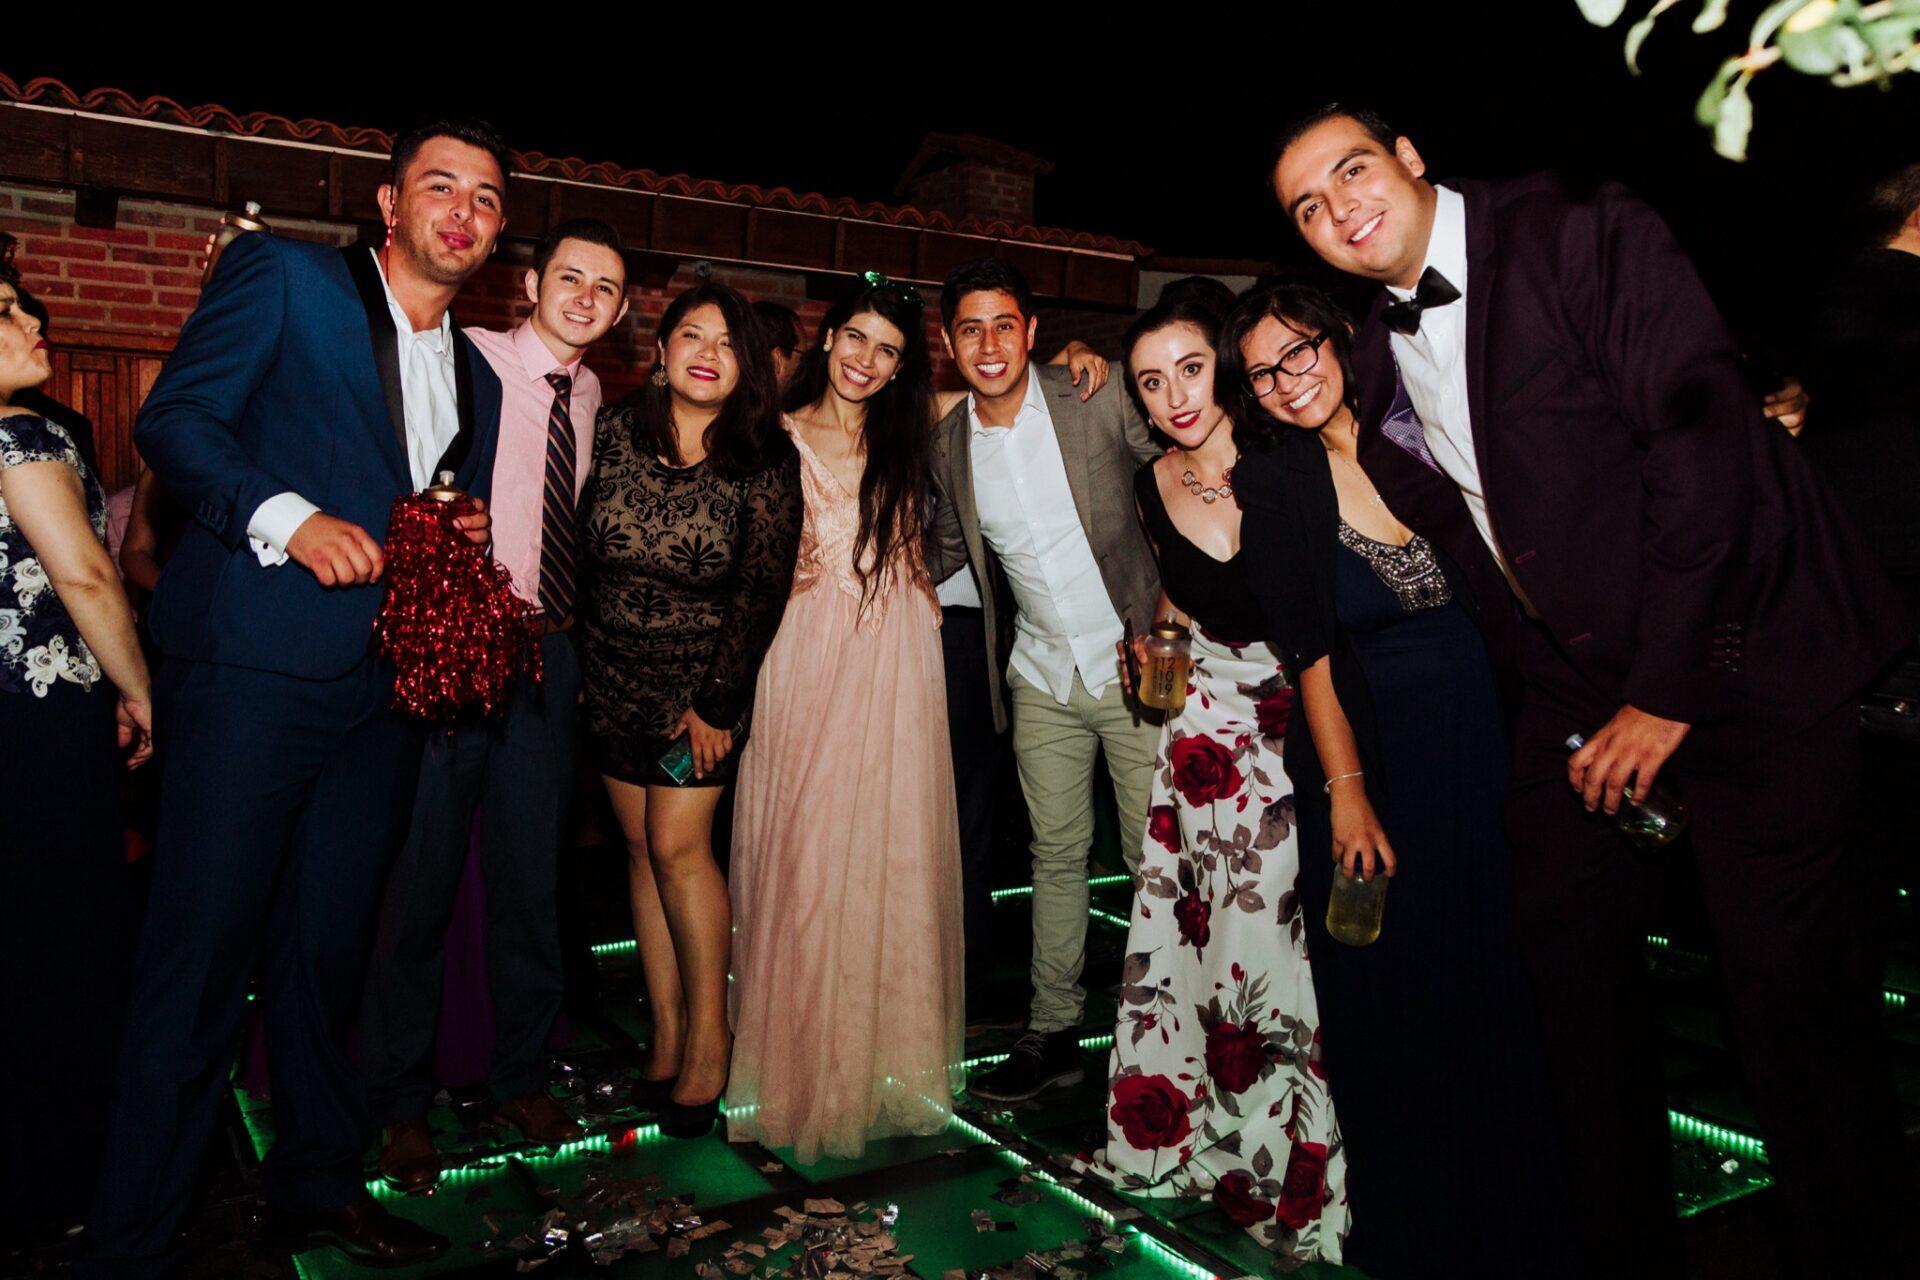 javier_noriega_fotografo_bodas_teul_zacatecas_wedding_photographer43